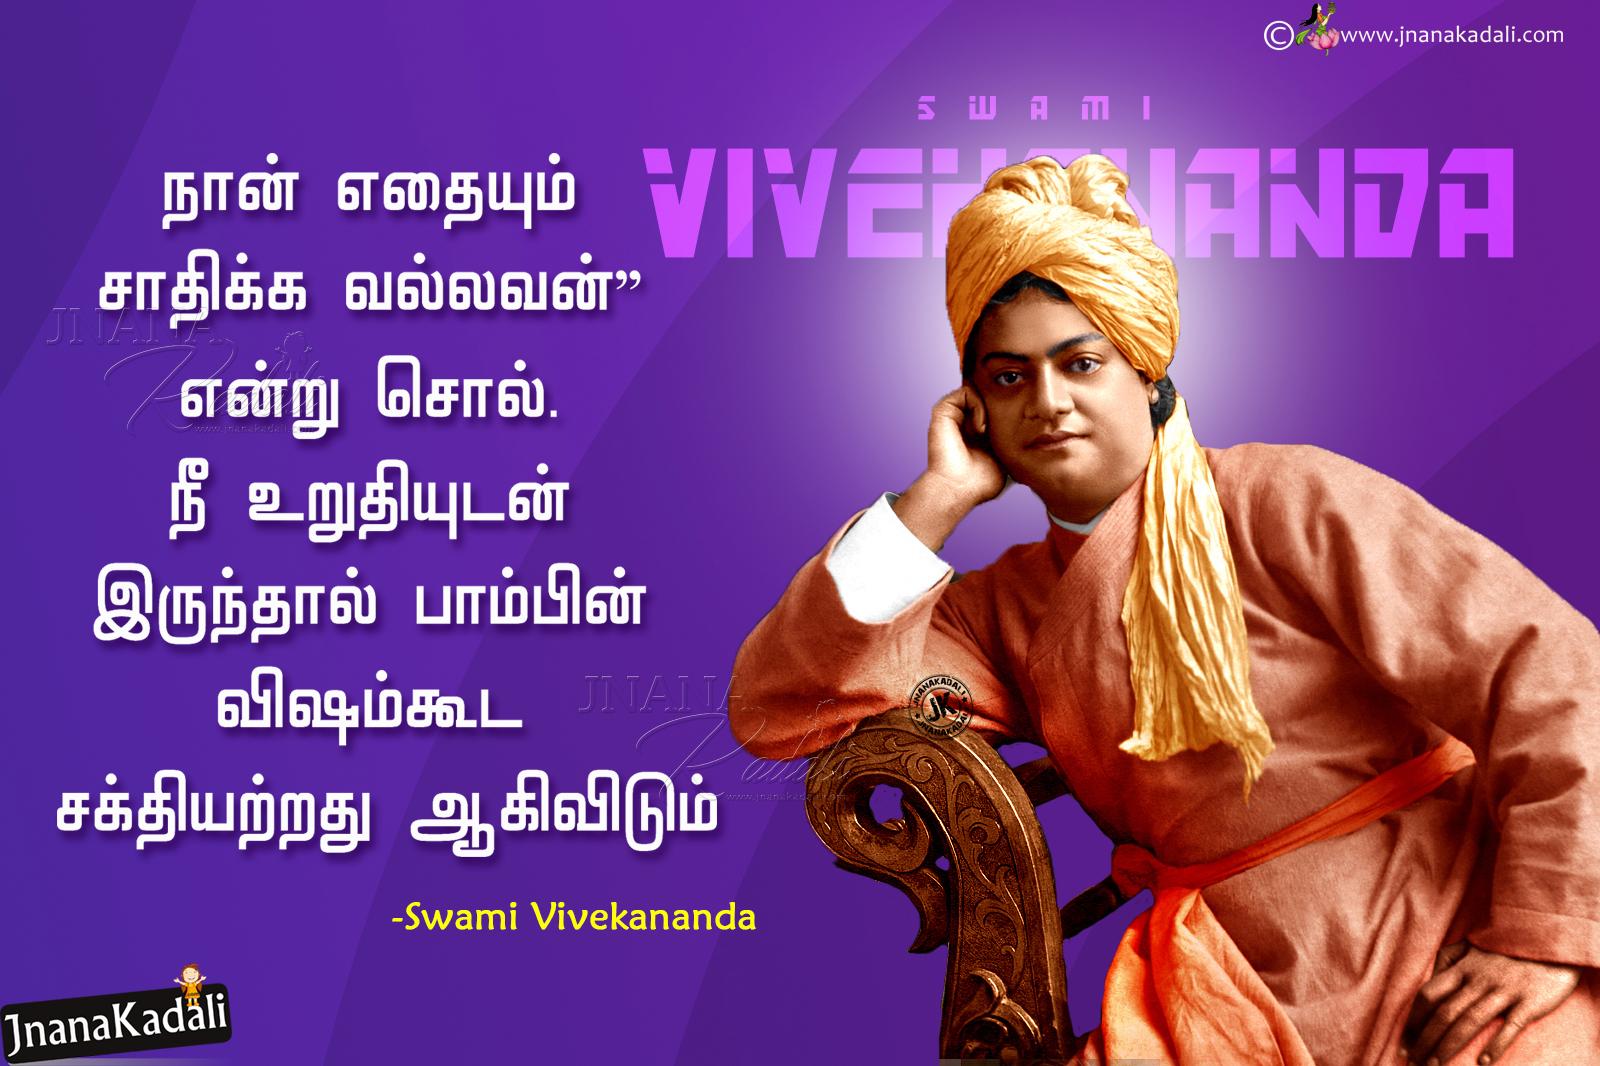 swami vivekananda tamil motivational speeches famous tamil vivekananda quotes hd wallpapers jnana kadali com telugu quotes english quotes hindi quotes tamil quotes dharmasandehalu swami vivekananda tamil motivational